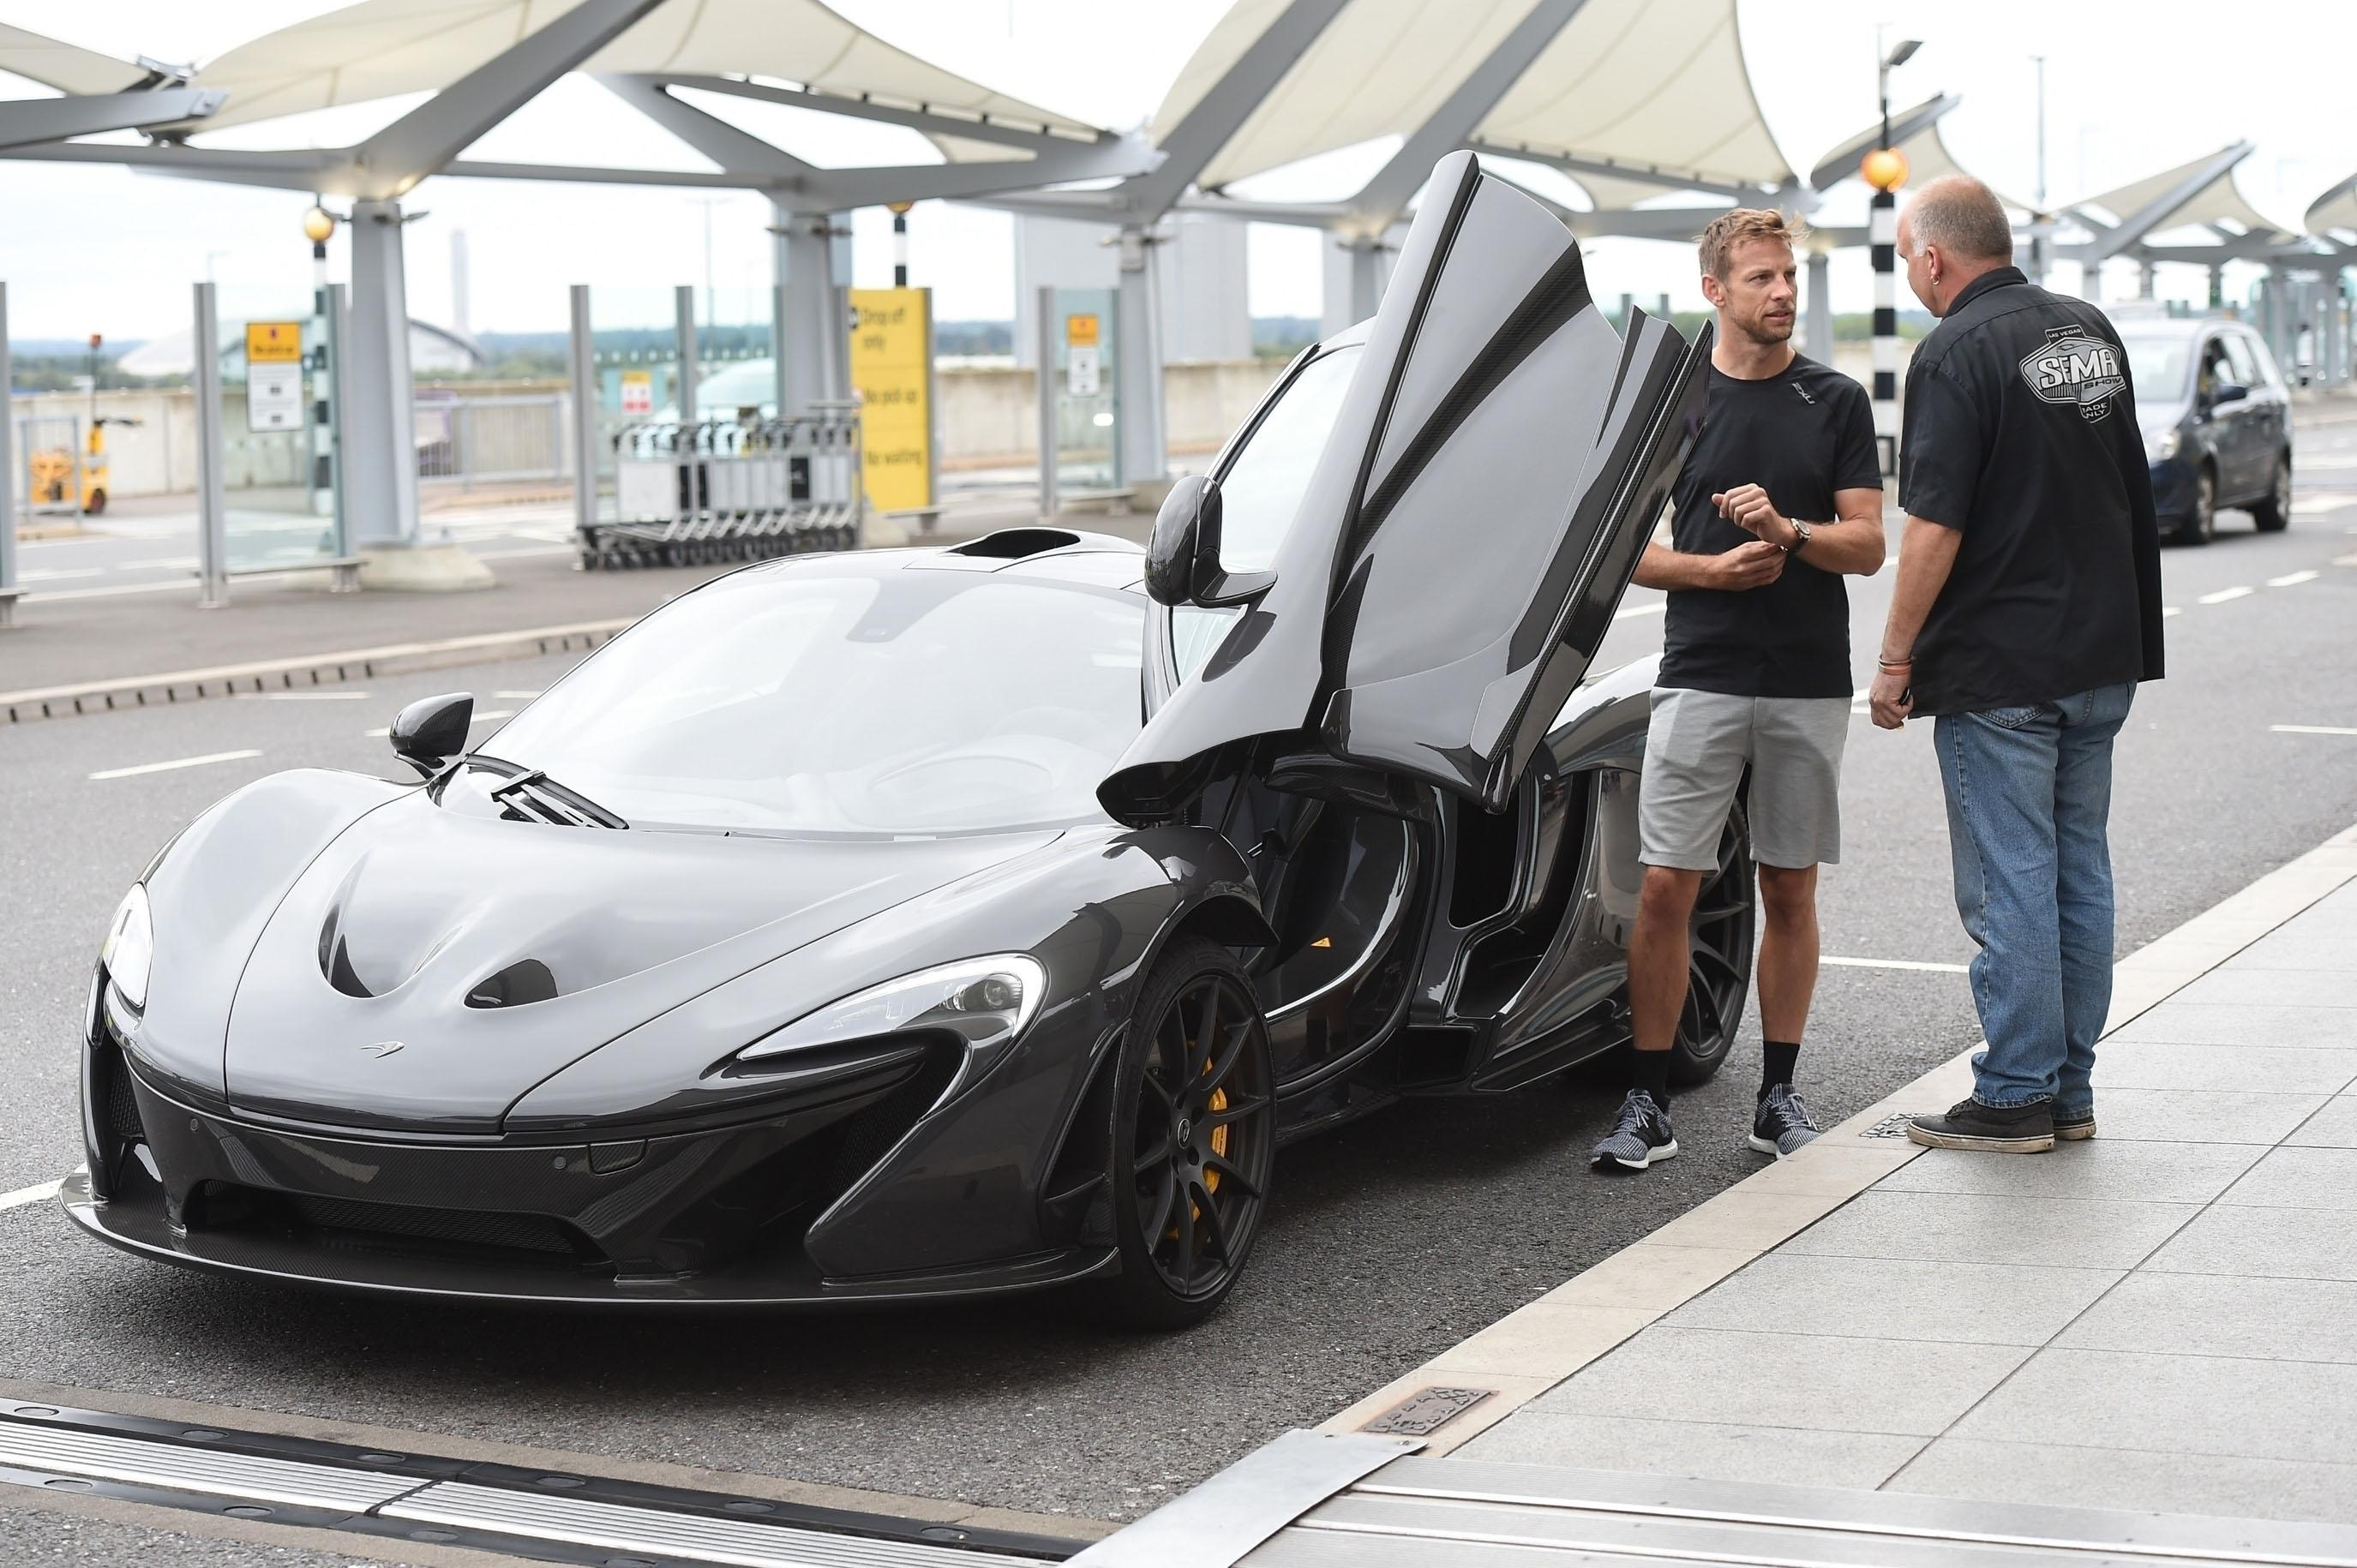 Jenson Button picks up his new McLaren at Heathrow Airport